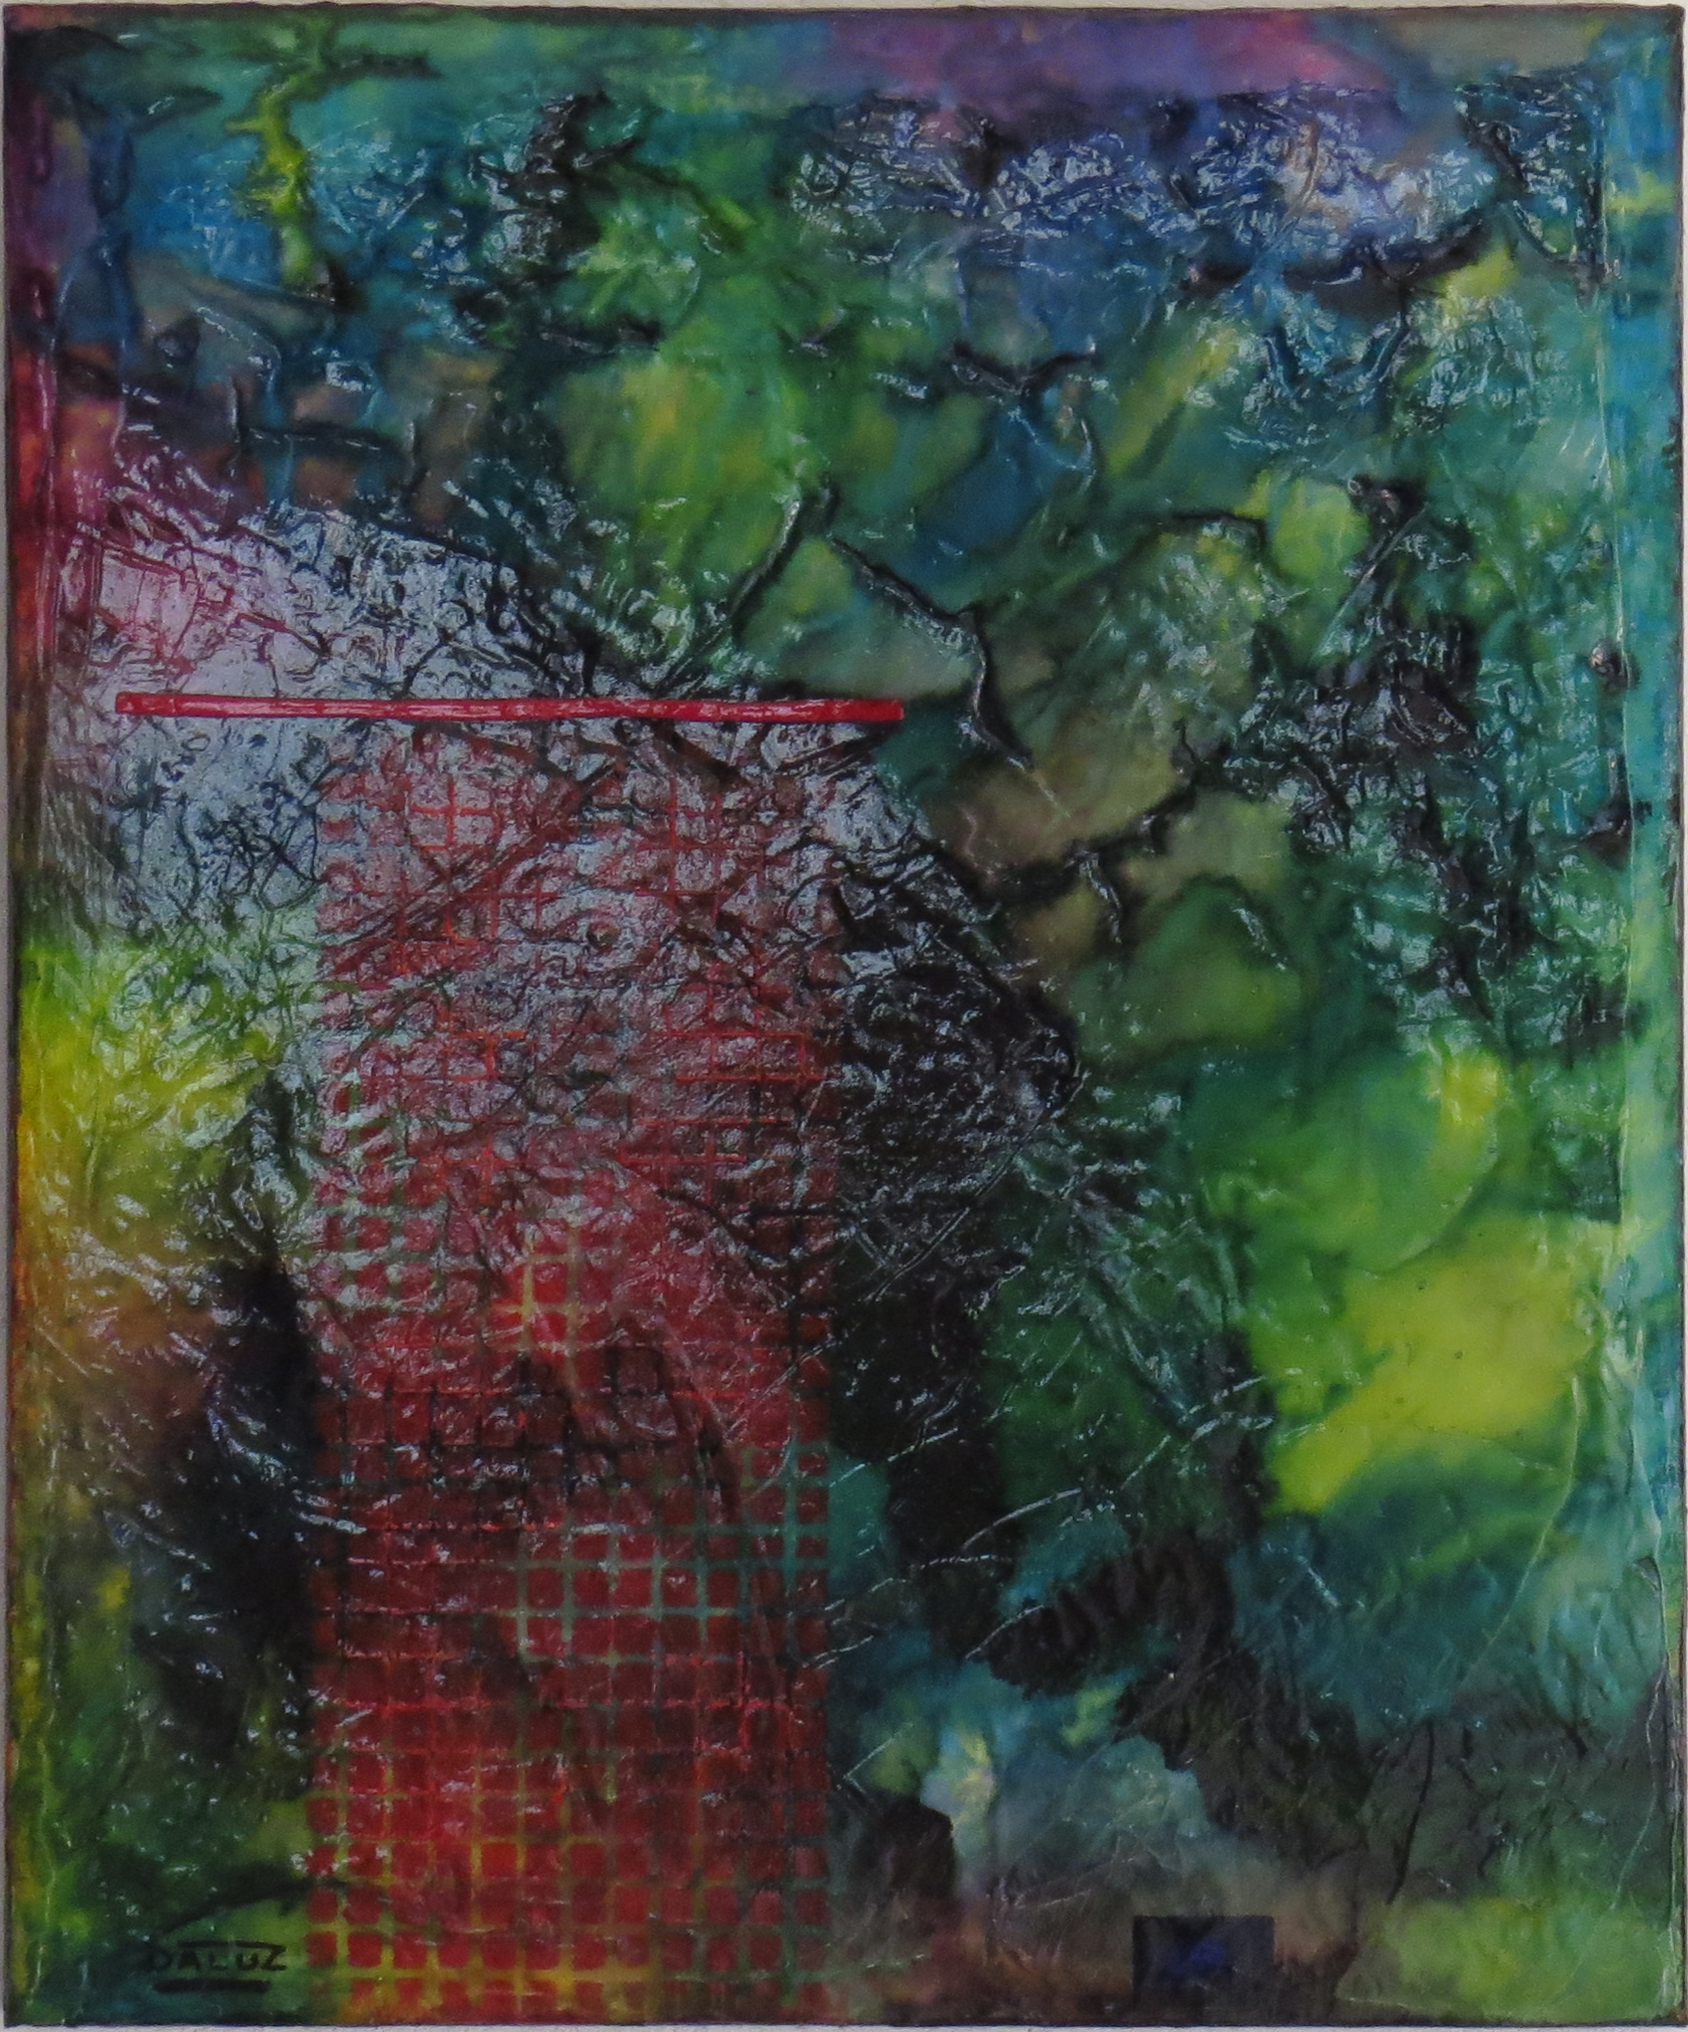 nimbes - vue face2 - DALUZ GALEGO - peinture abstraite